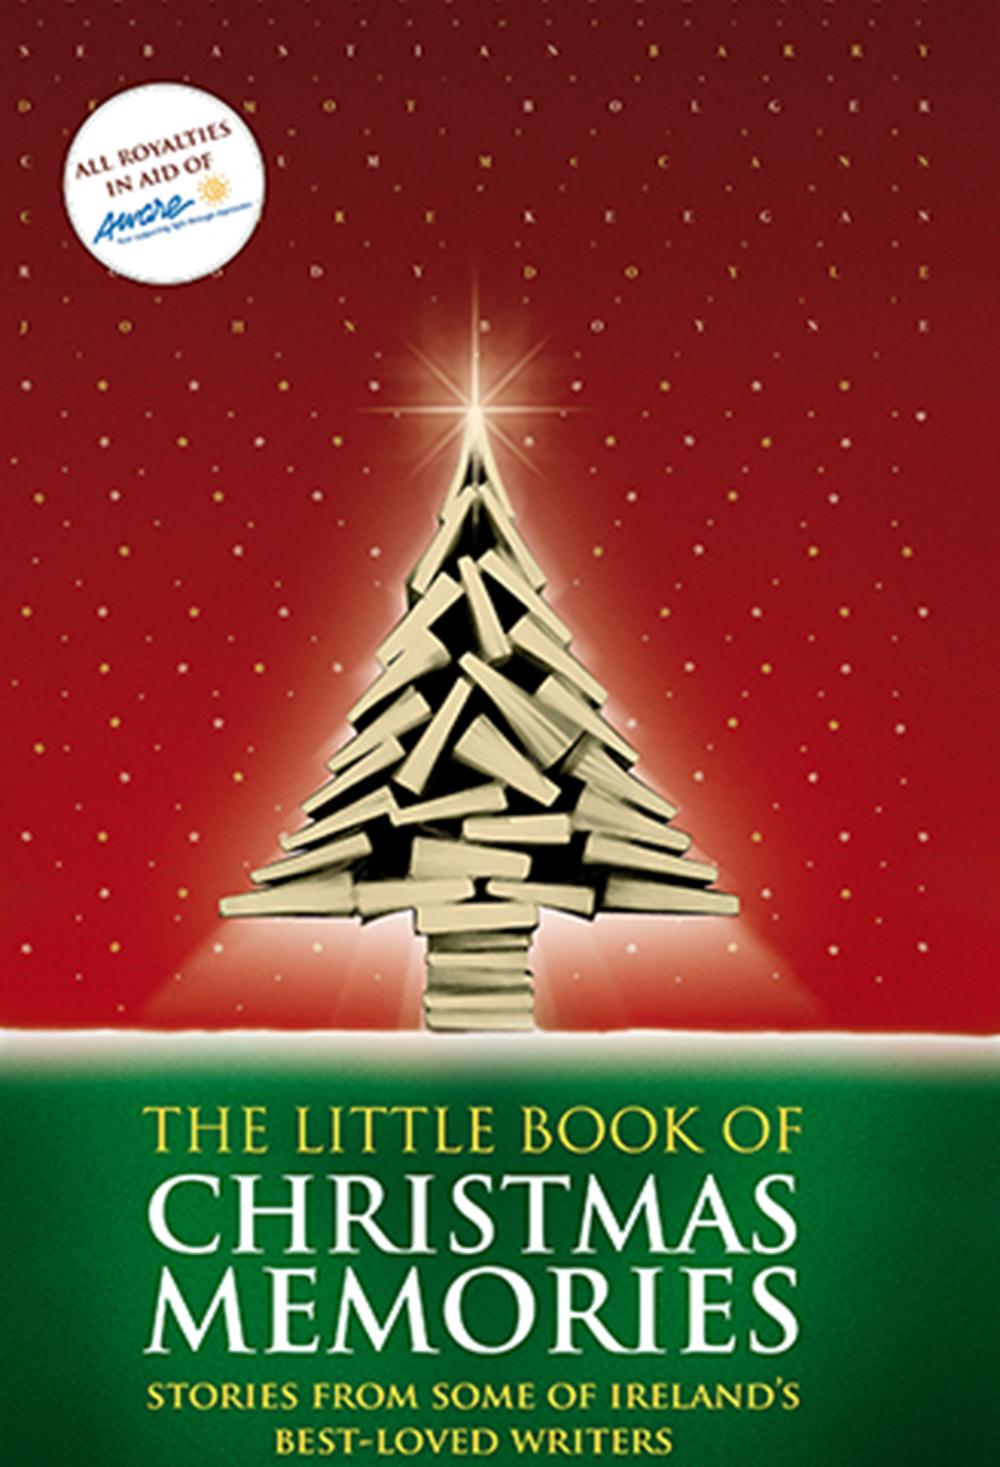 little book of christmas memories liberties press - Christmas Memories Book